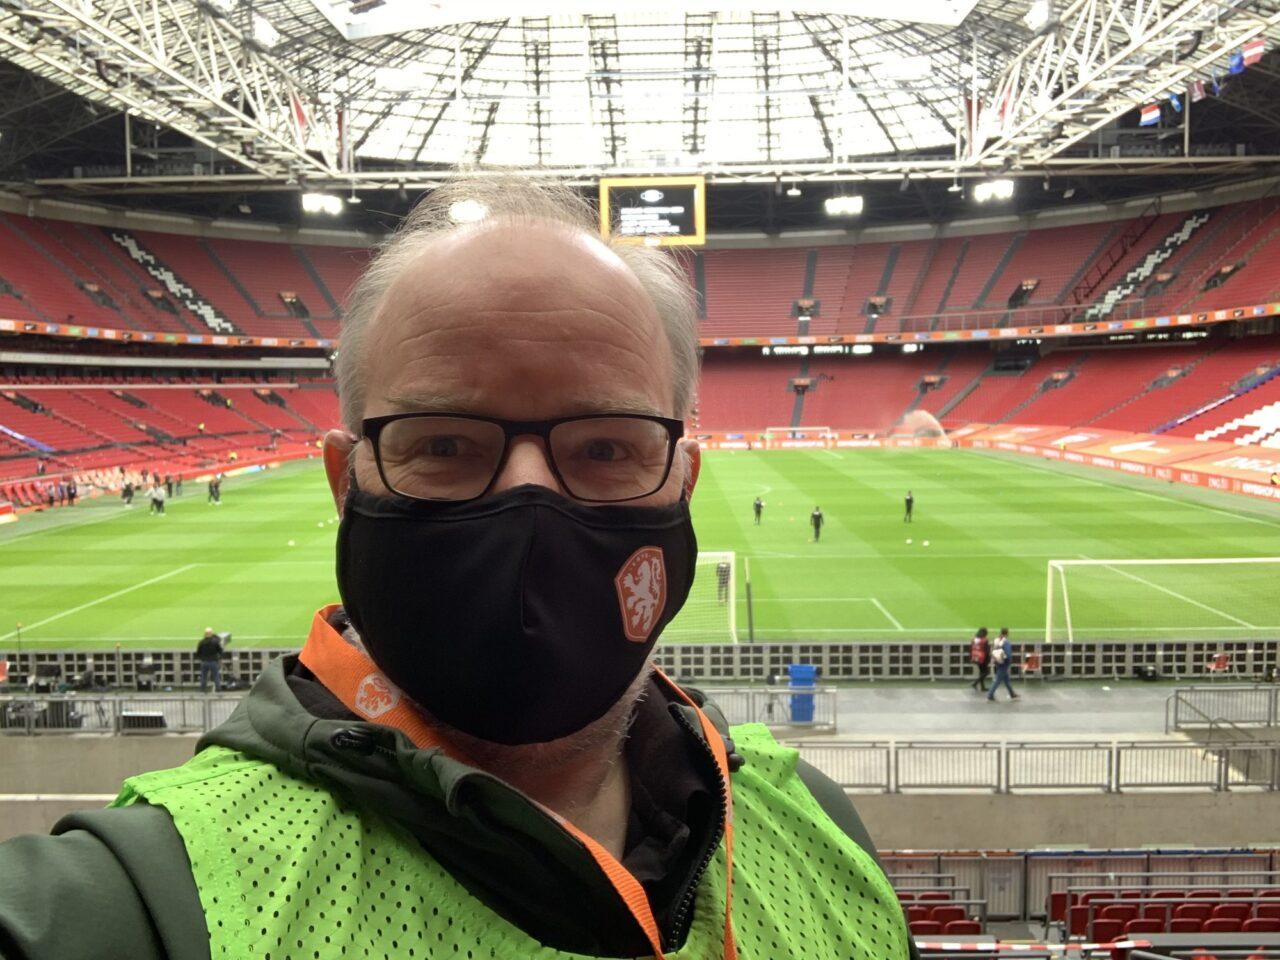 job van exel fieldlabs coronacheck eshpm Amsterdam Arena eigen foto (EM)